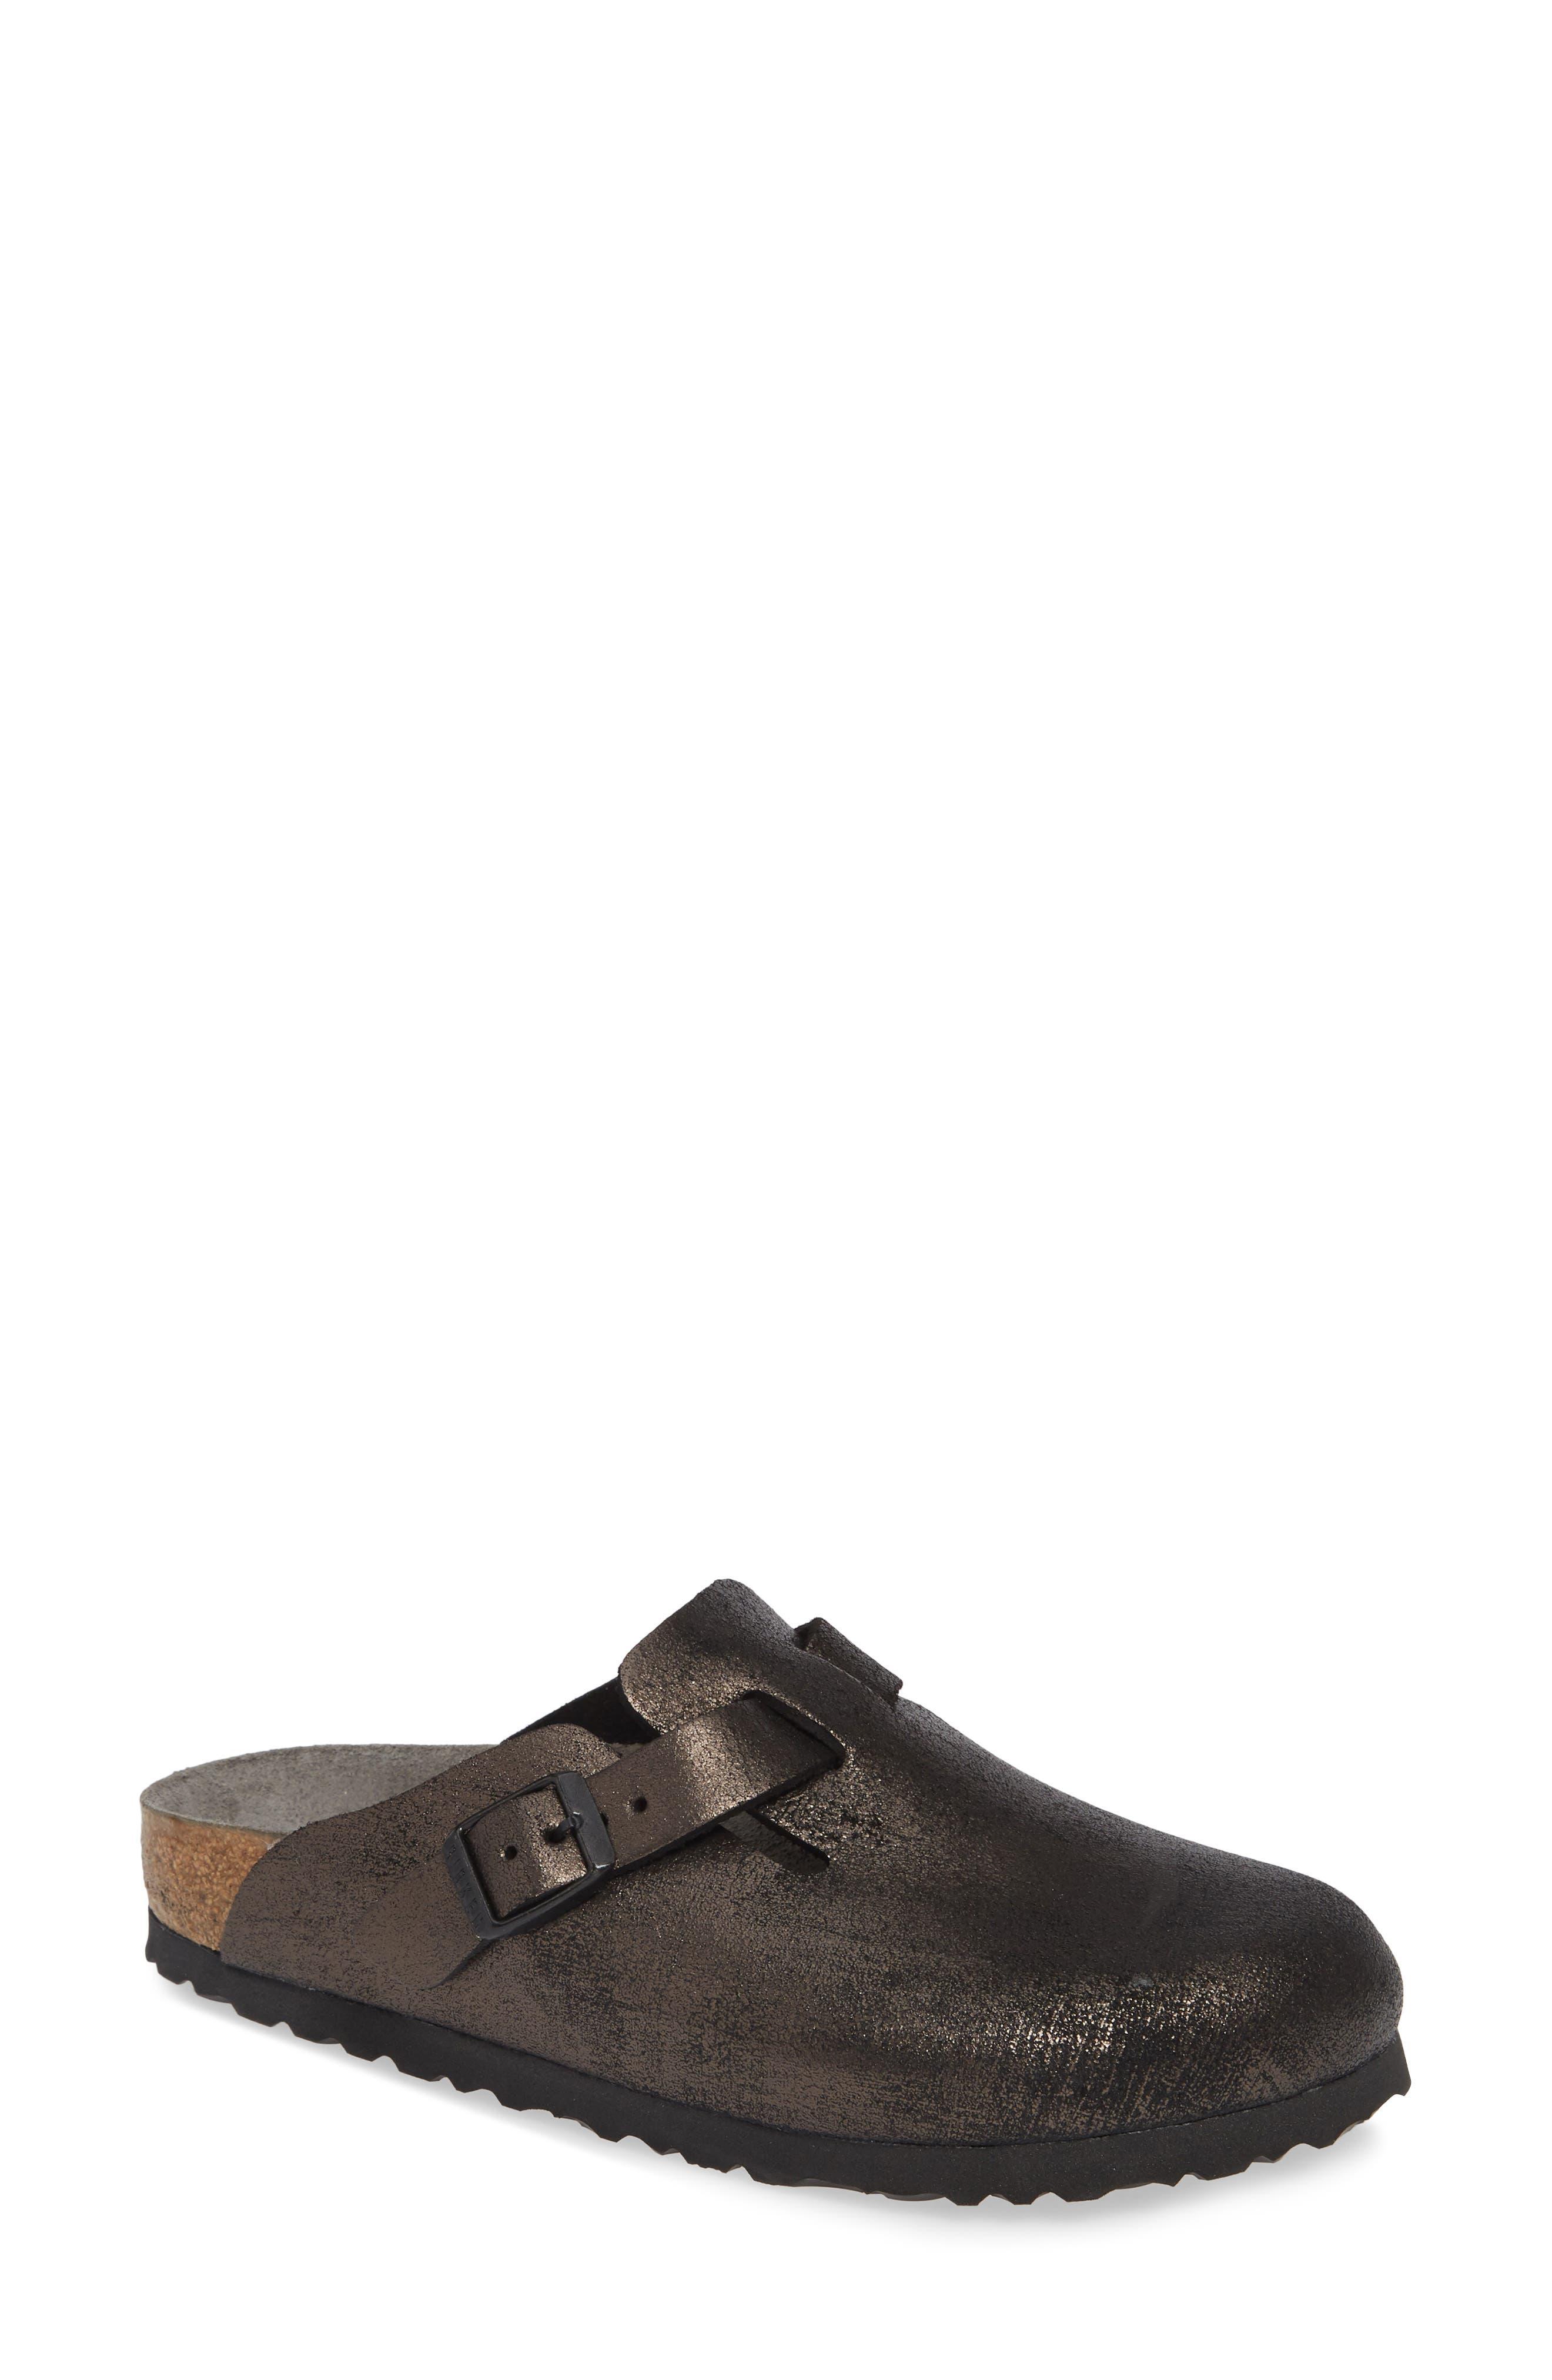 BIRKENSTOCK Boston Soft Footbed Clog, Main, color, METALLIC ANTIQUE BLACK LEATHER